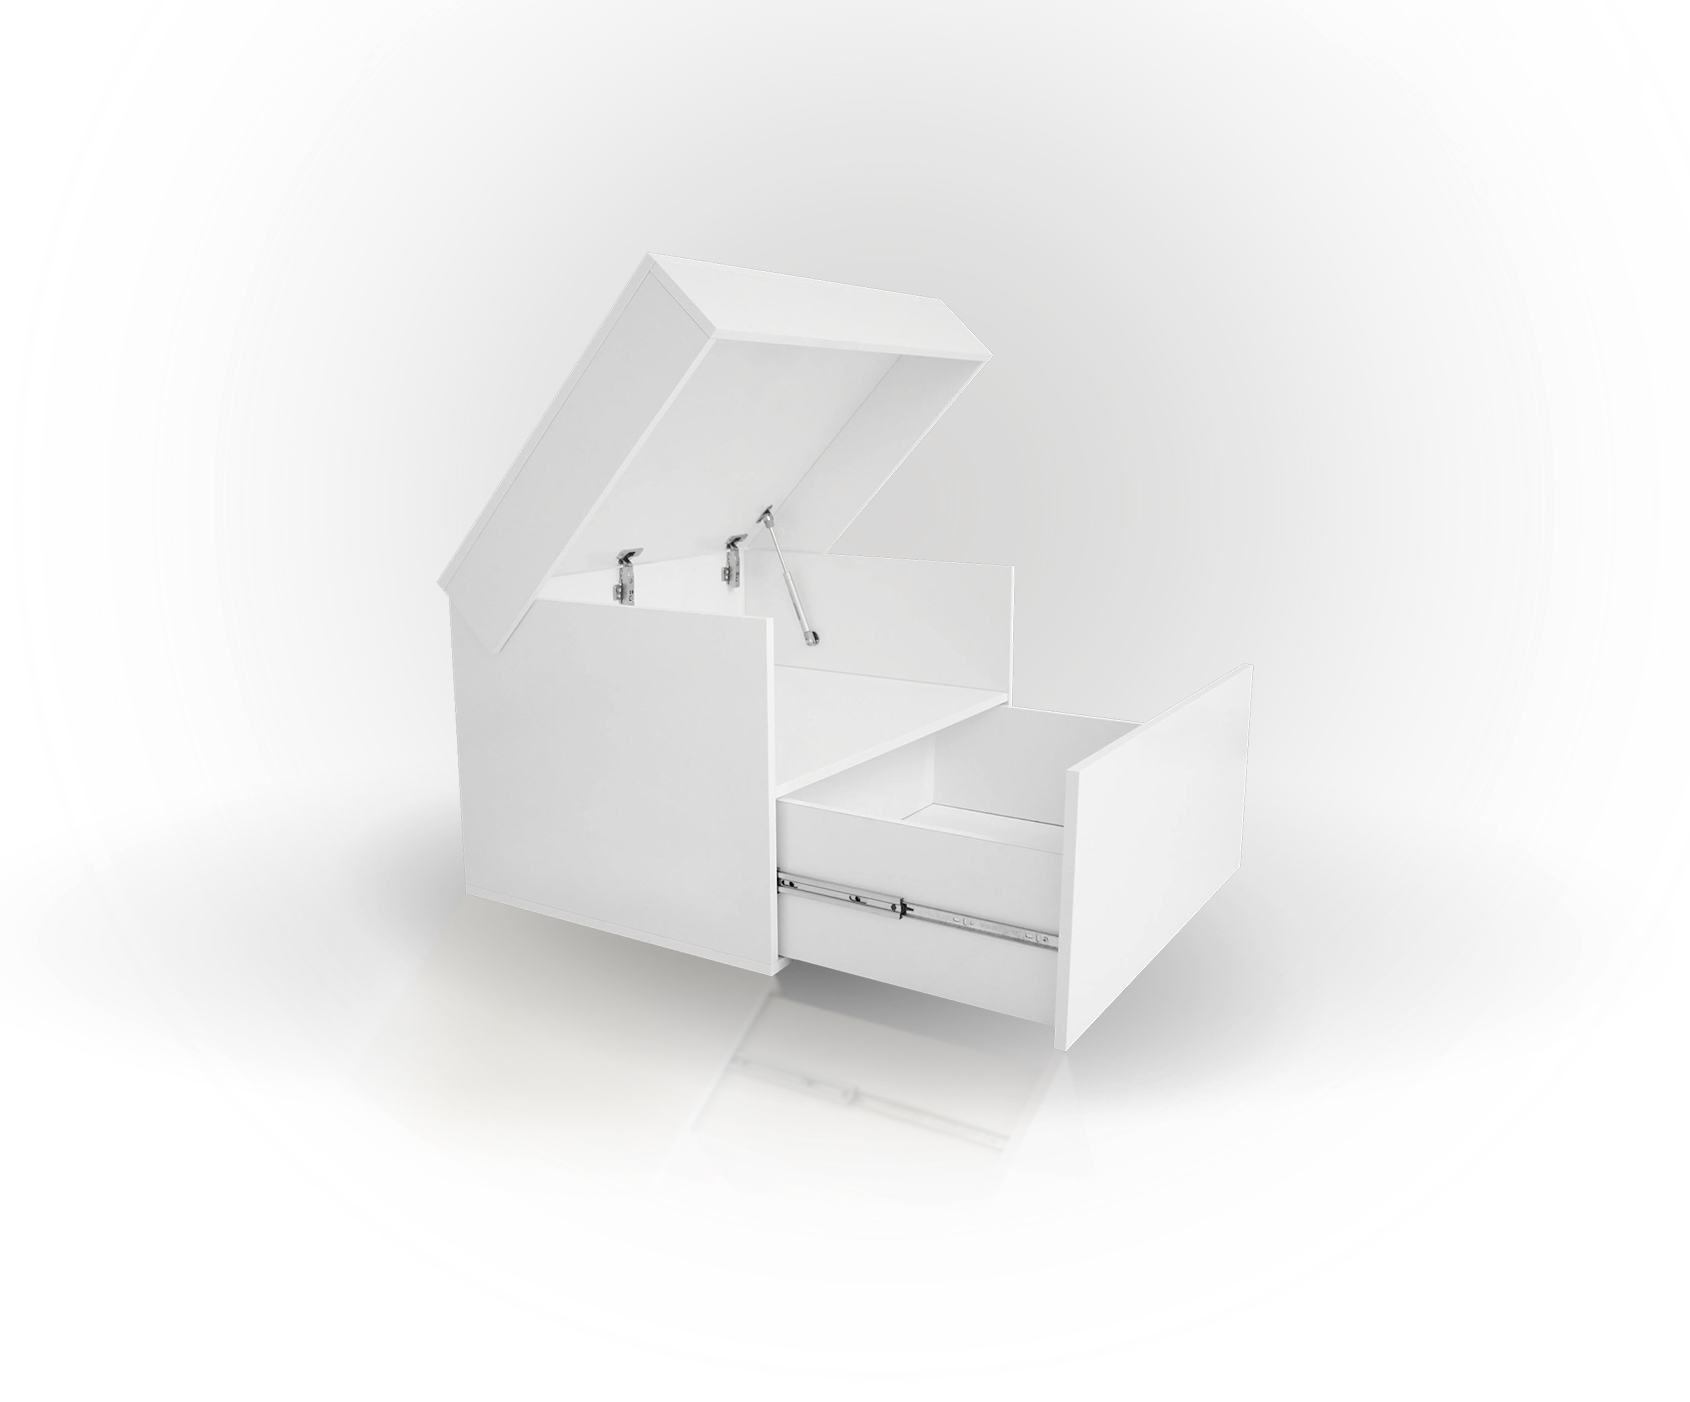 ec7ec814ad86e Sneakerbox Schuhschrank - So individuell wie Du selbst